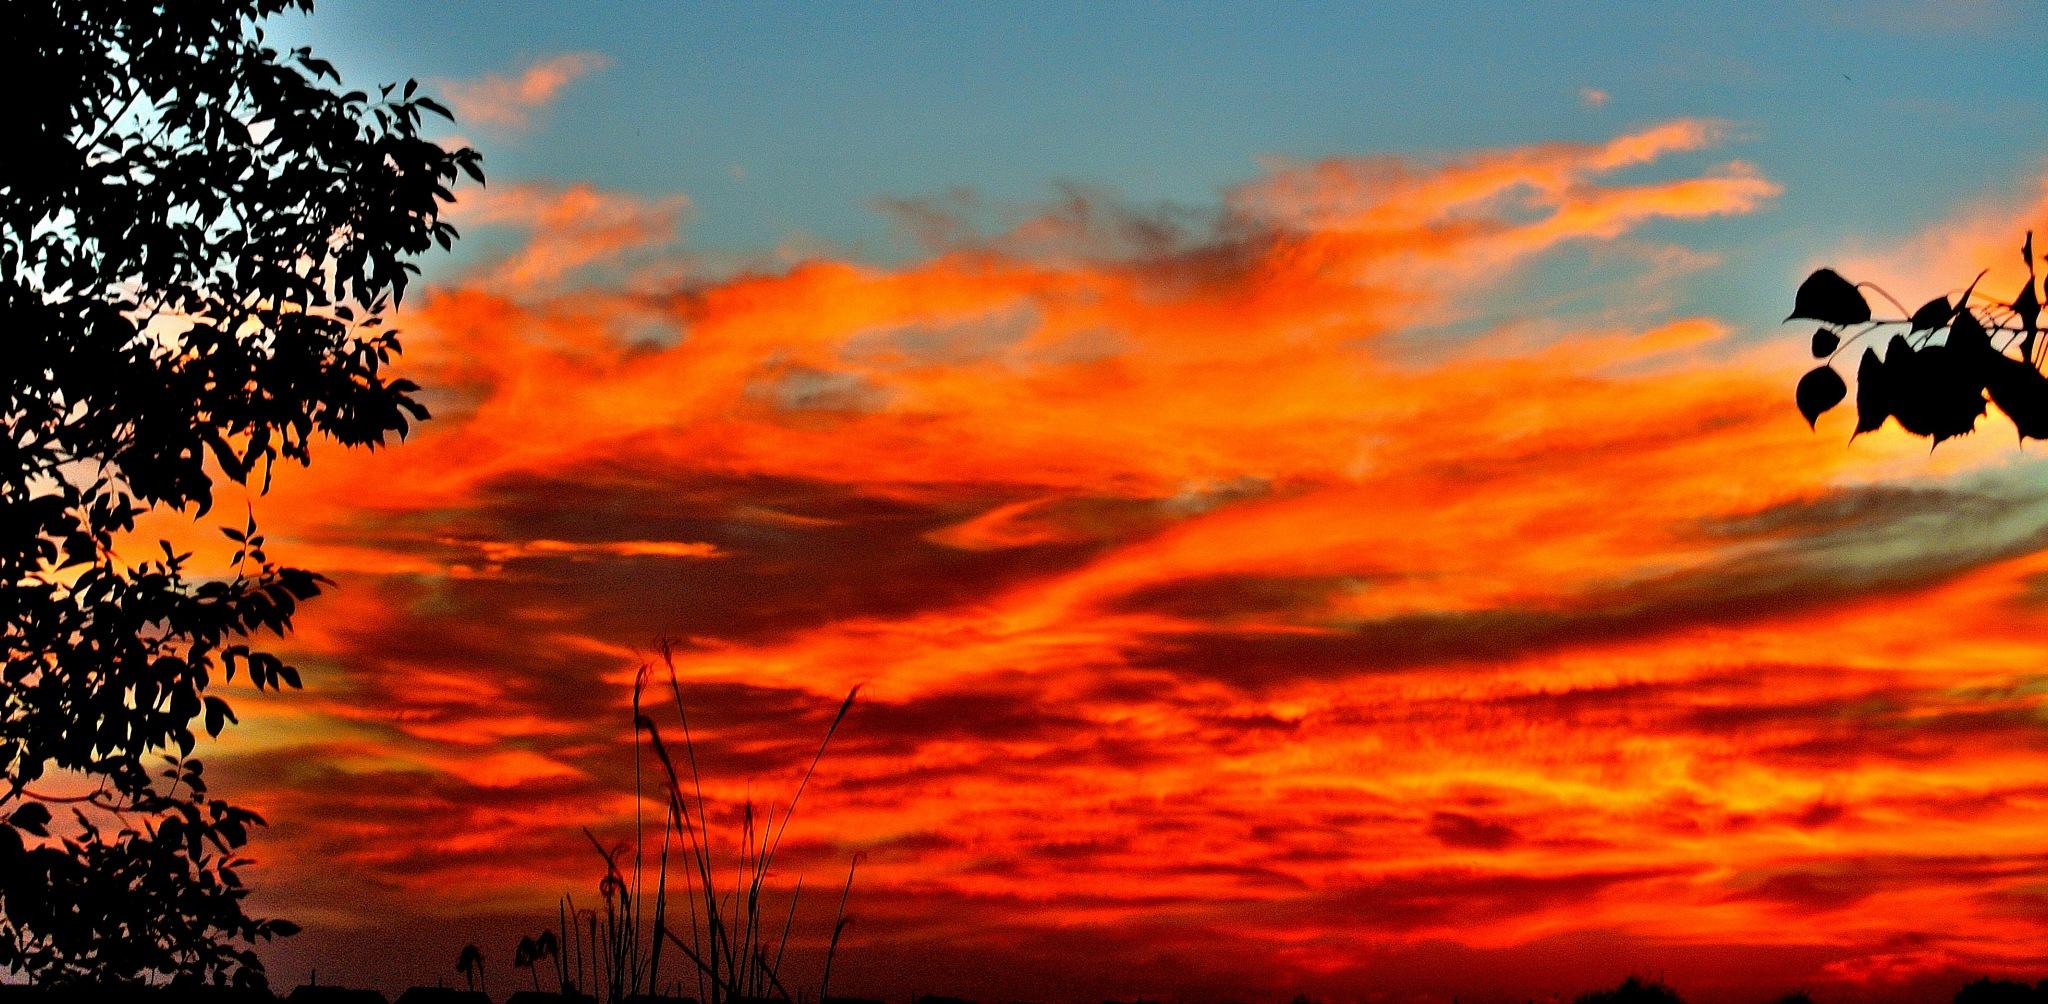 Drama in the sky by maria.telegdy